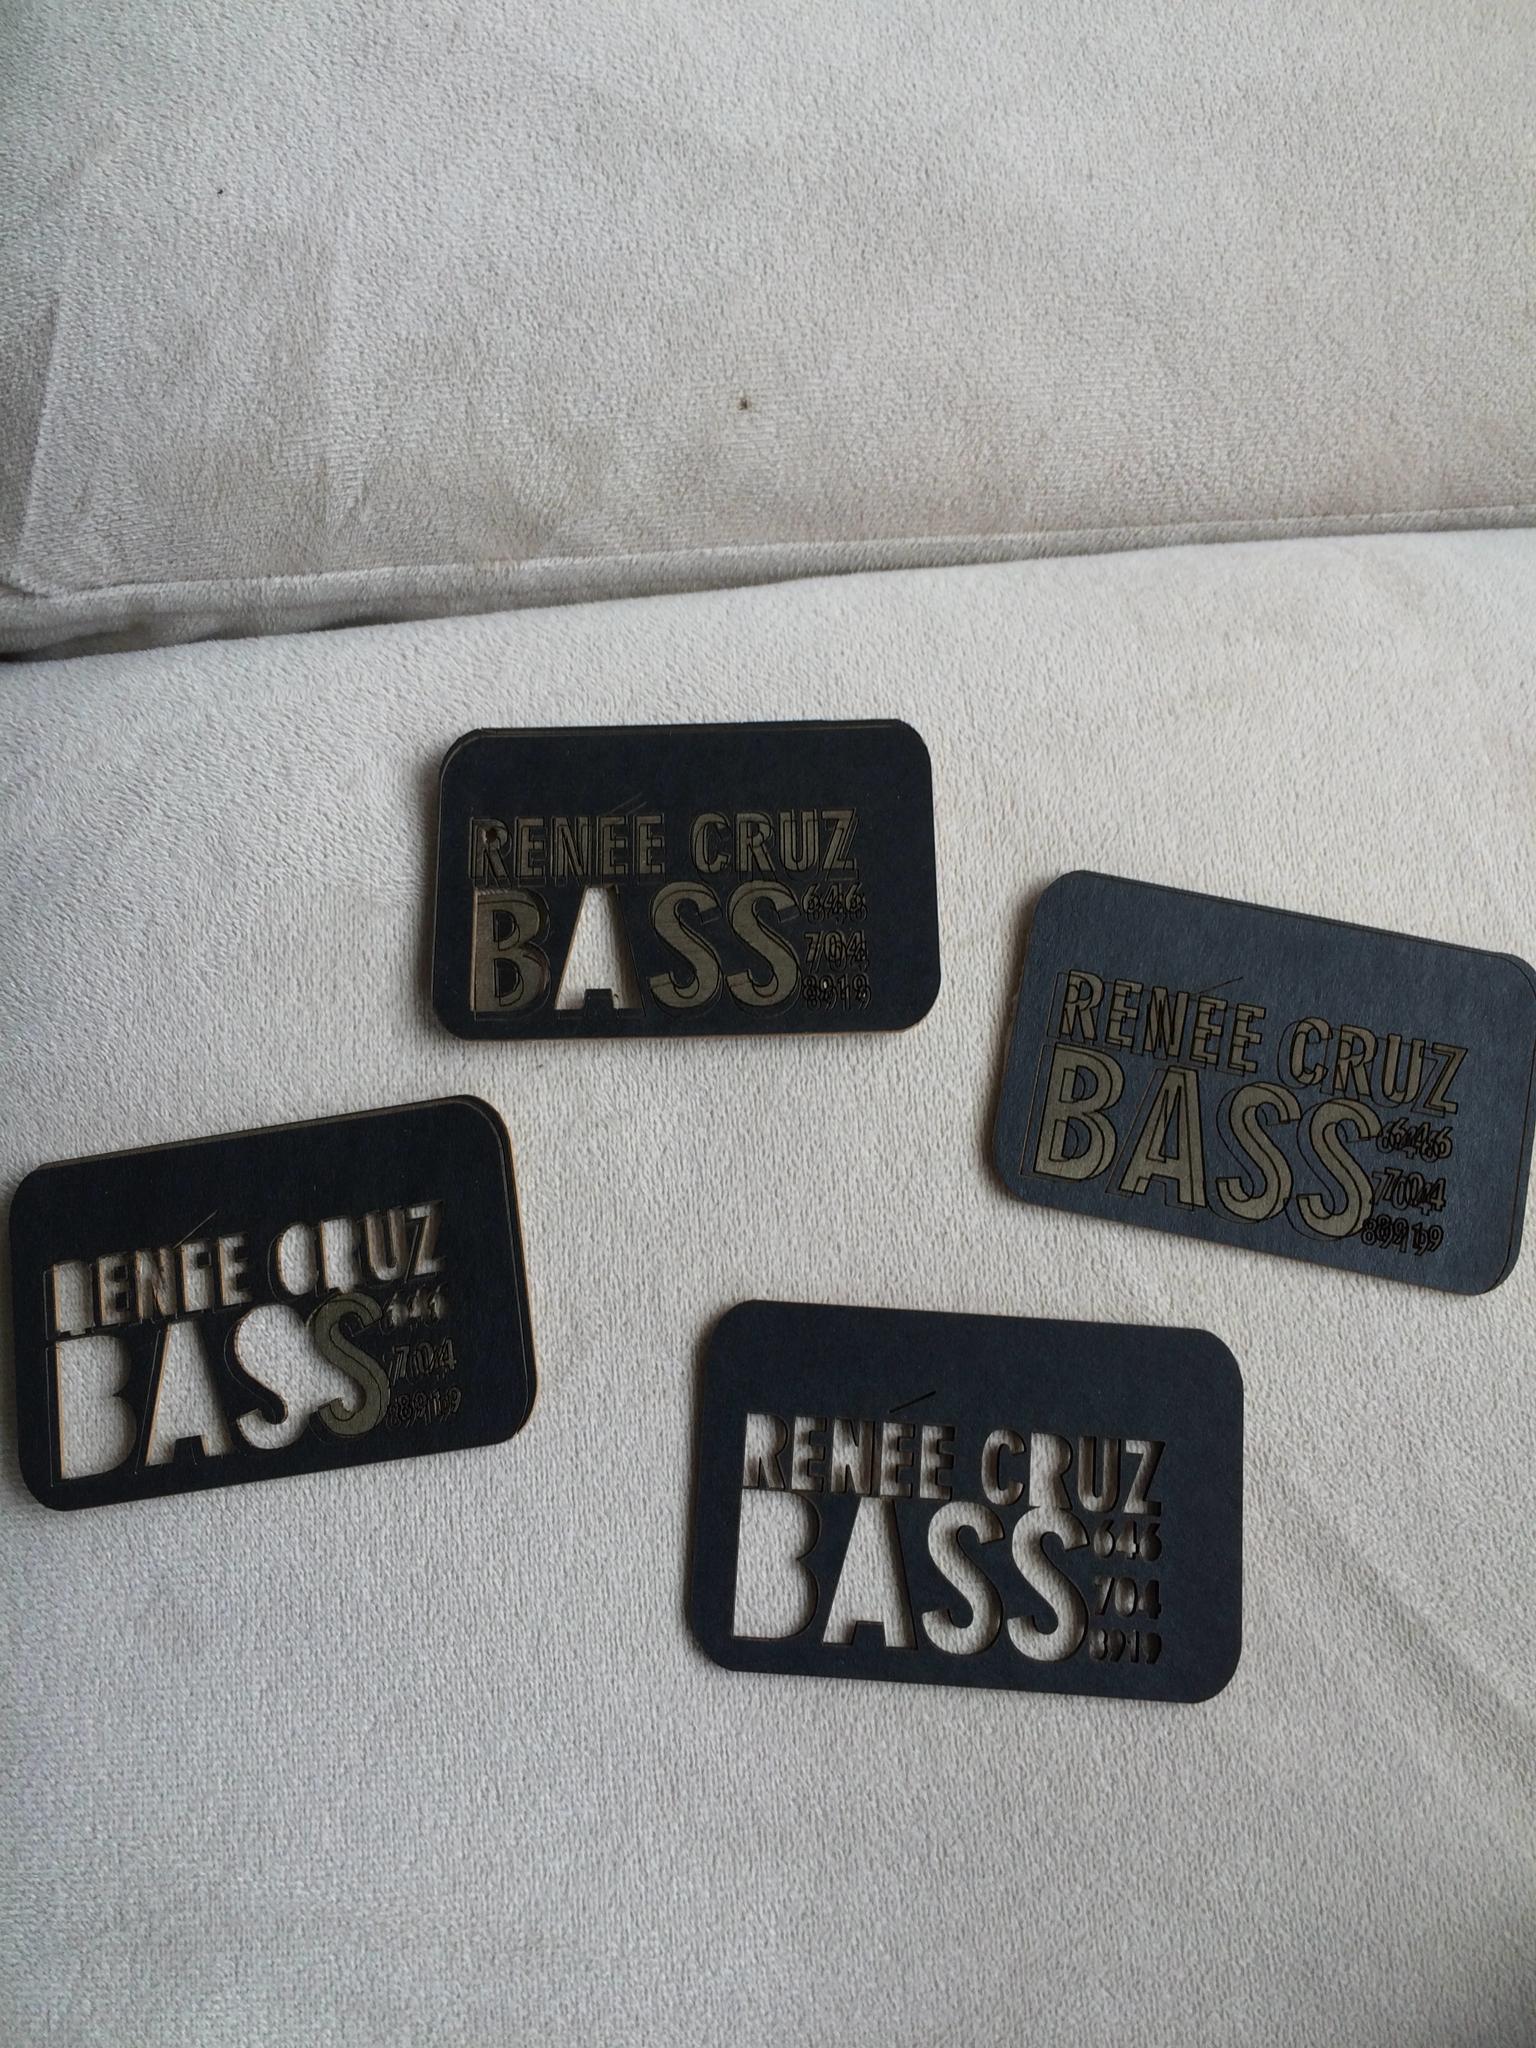 Renée Cruz - Laser Cut Business Cards